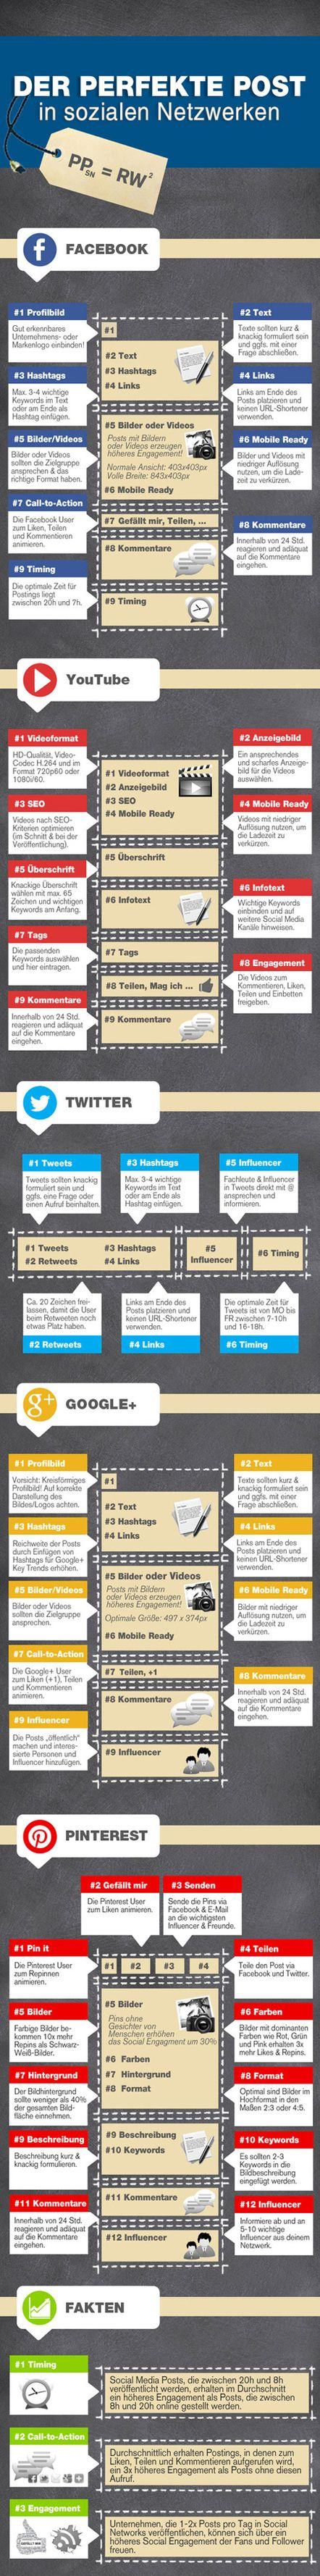 PAGE Online - Der perfekte #Social #Media Post